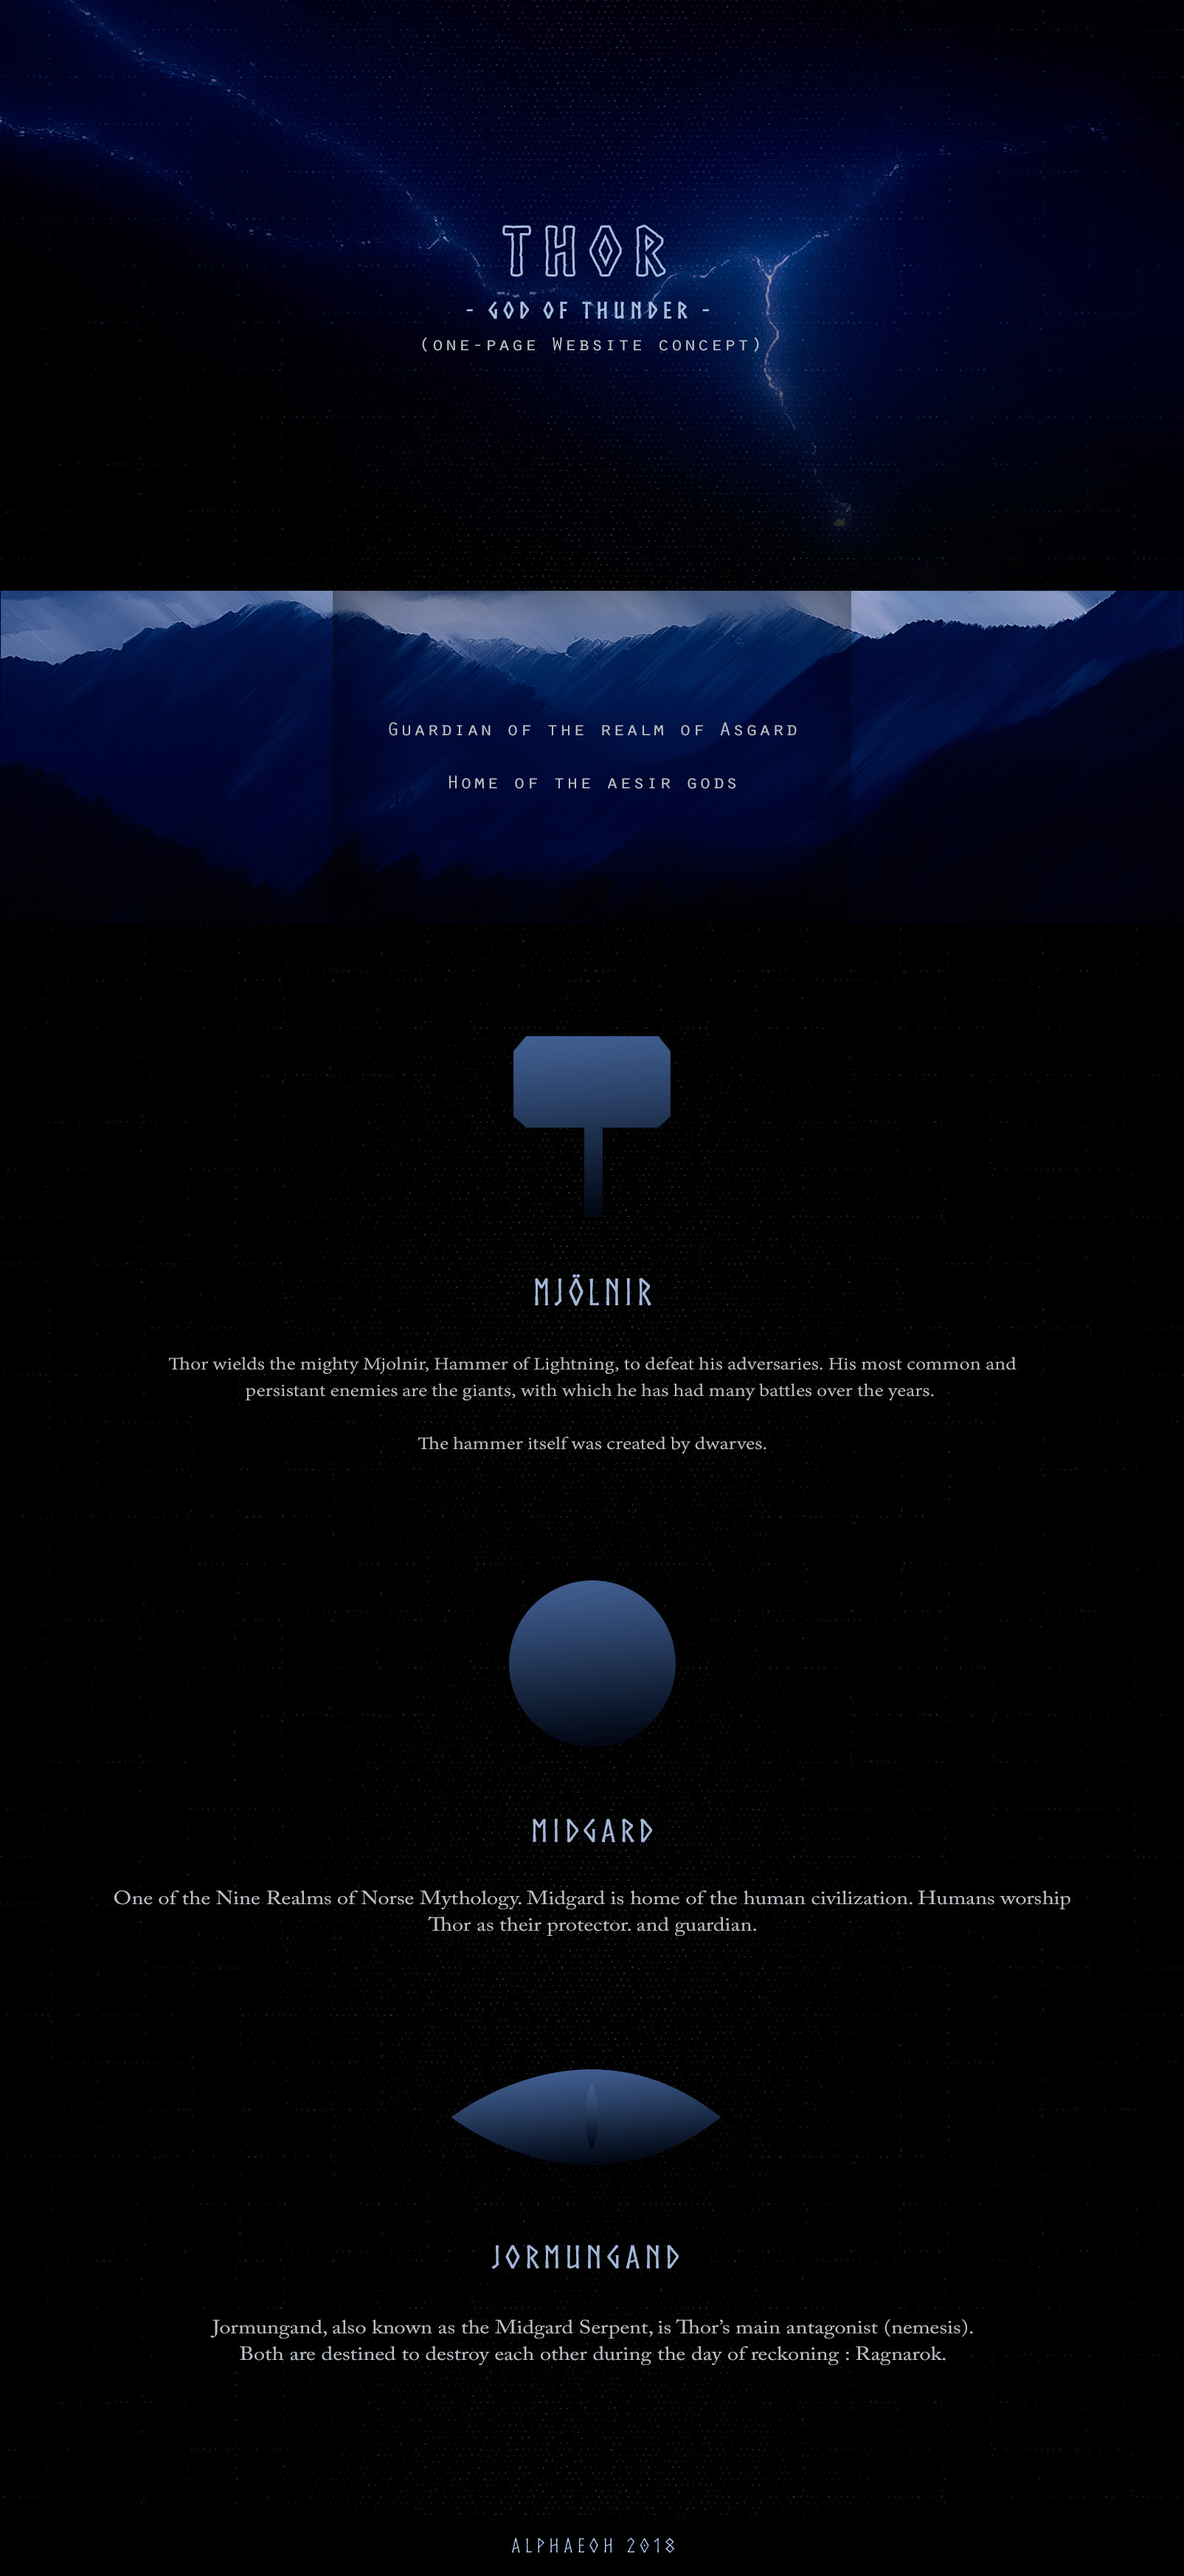 Alpha Eoh - Thor-Themed Website Concept